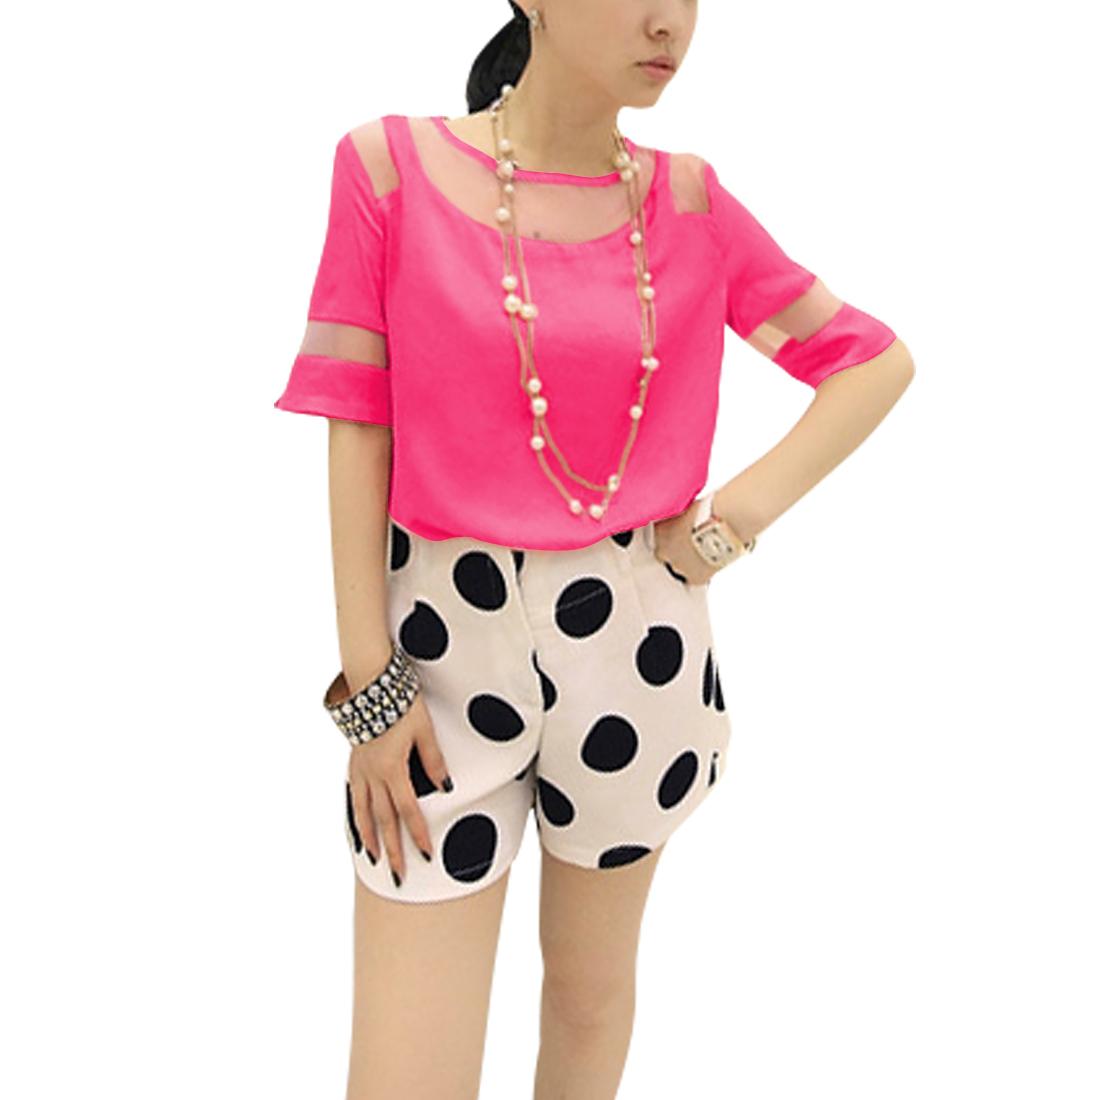 Ladies Round Neck Pullover Short Sleeve Semi Sheer Top Shirt Fuchsia XS